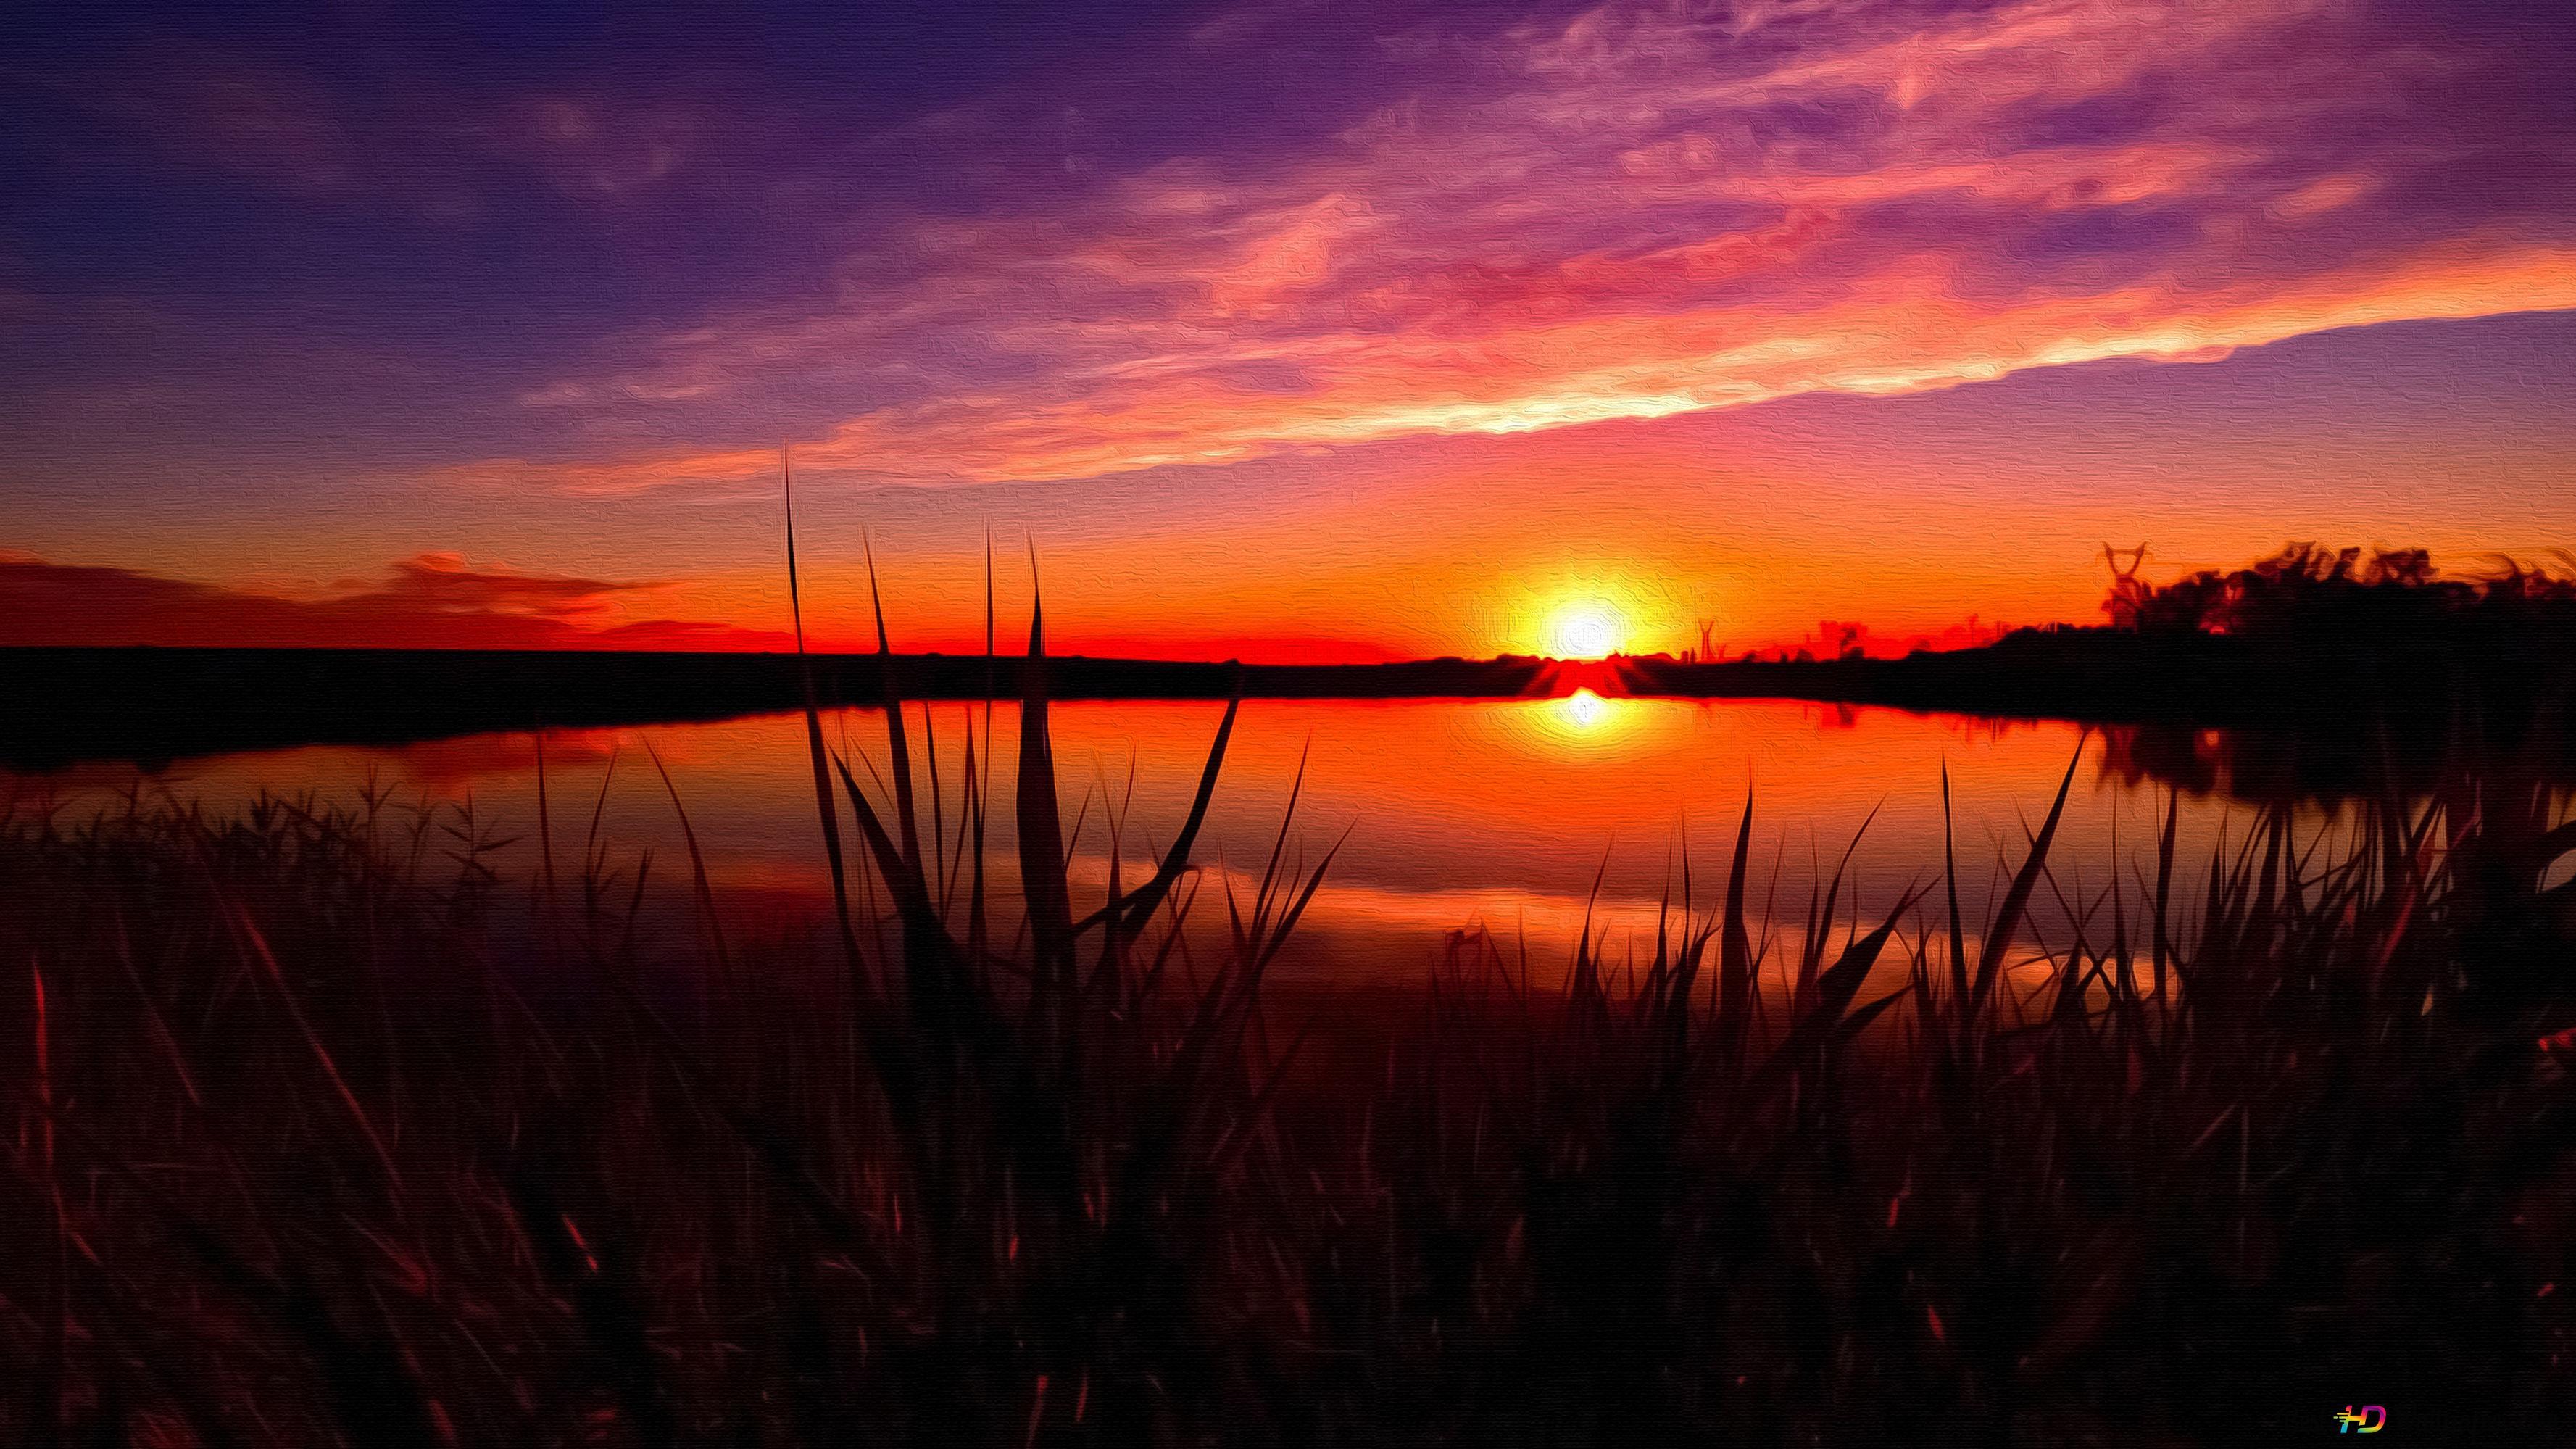 Sunset Reflection Hd Wallpaper Download